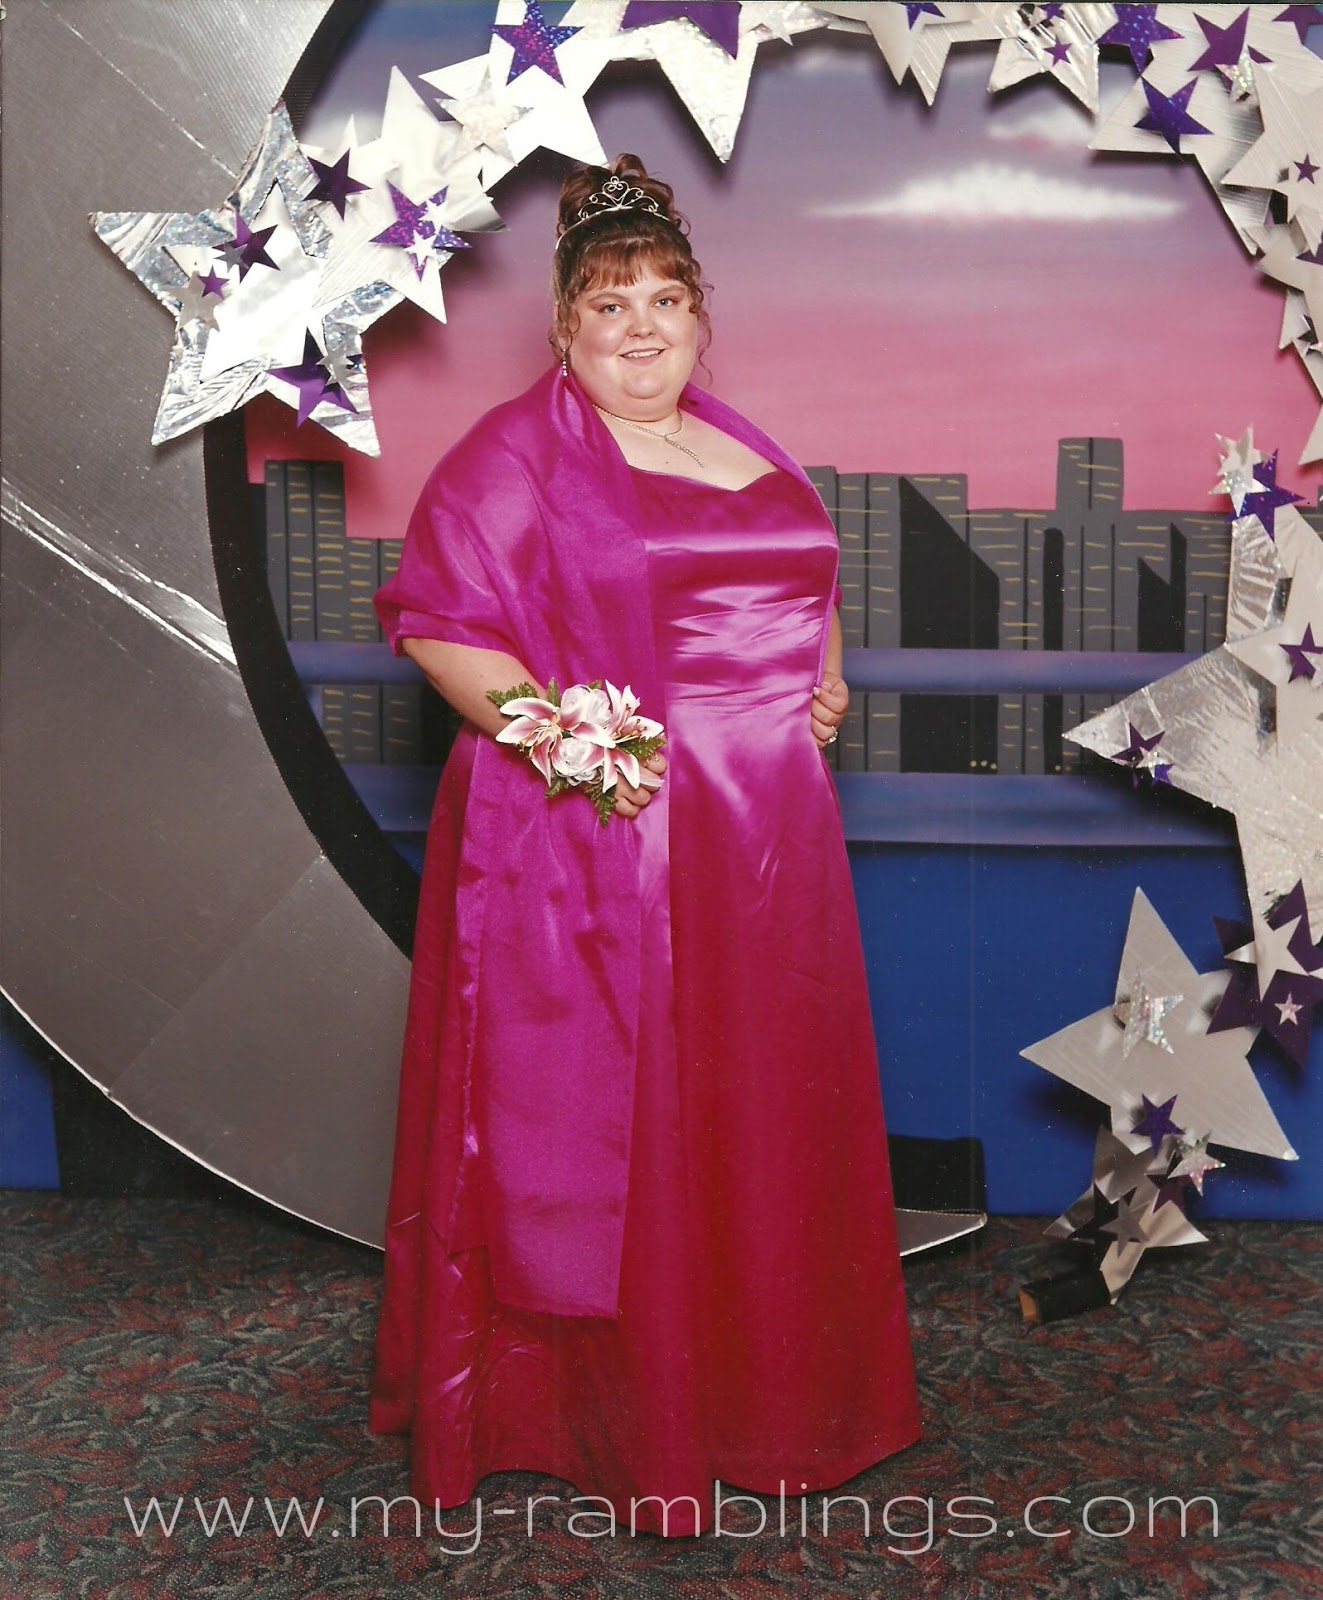 Fat Girl Prom Dresses - Homecoming Prom Dresses